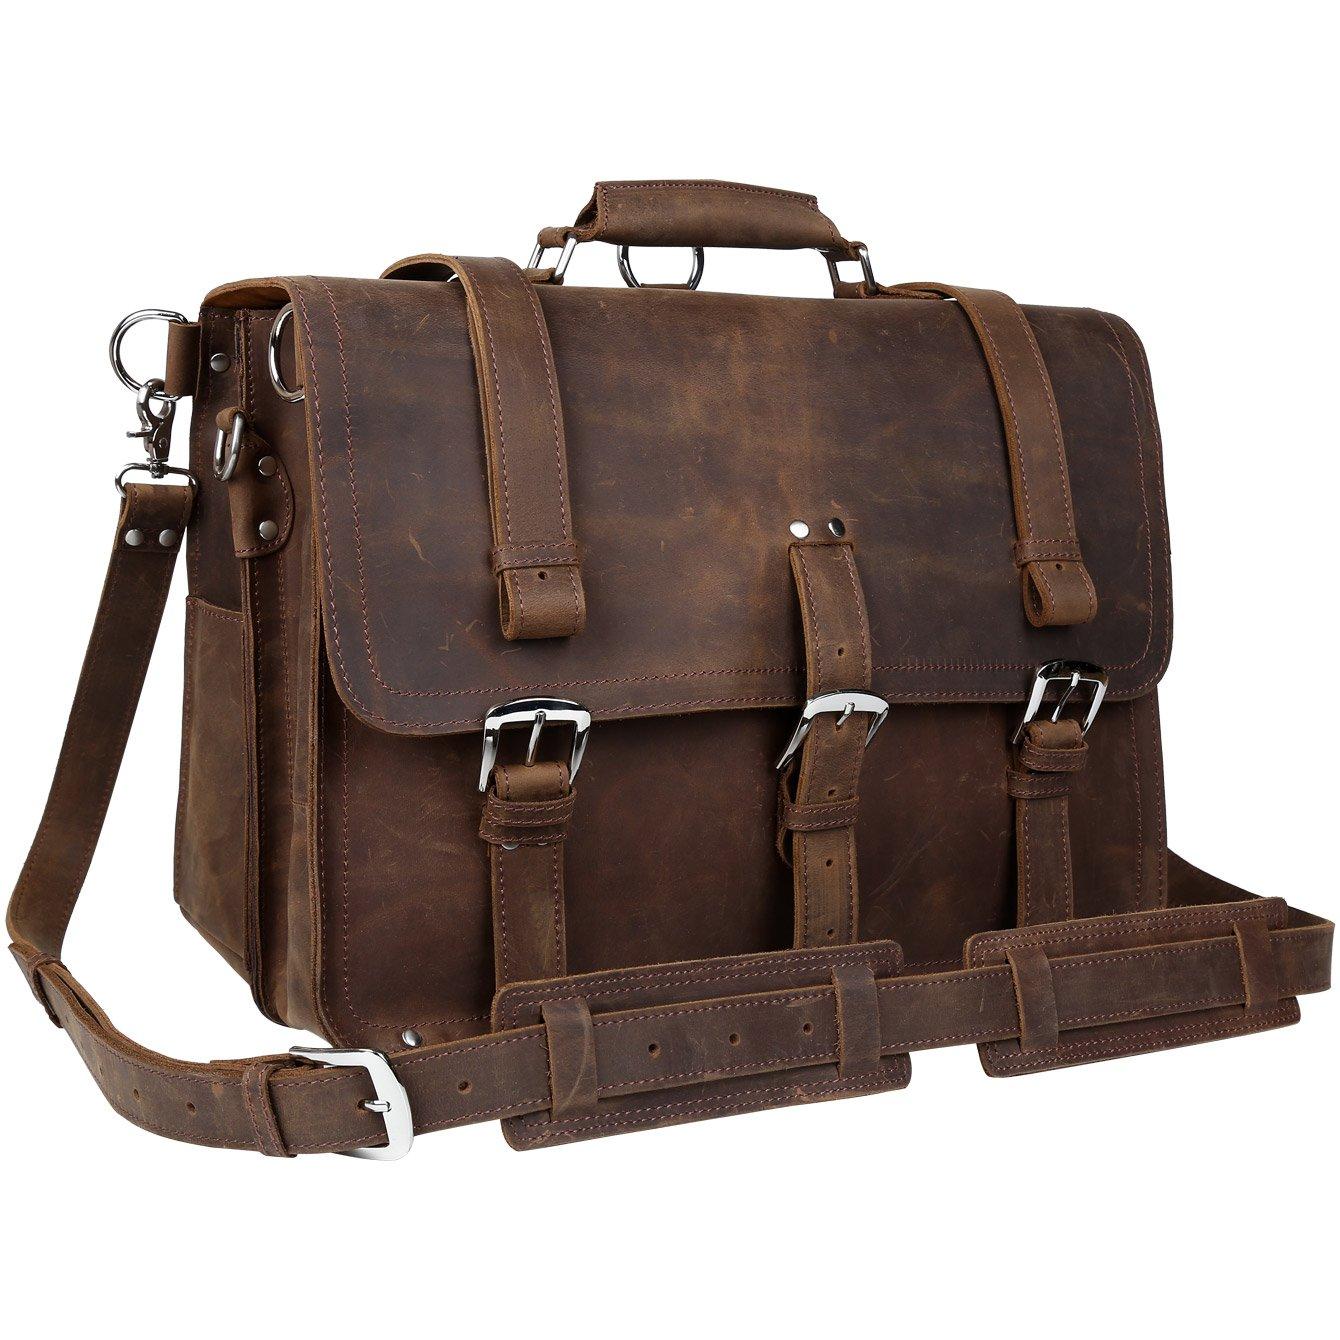 BAIGIO Vintage Leather Luggage Backpack Briefcase Travel Carryon Shoulder Bag (Brown)